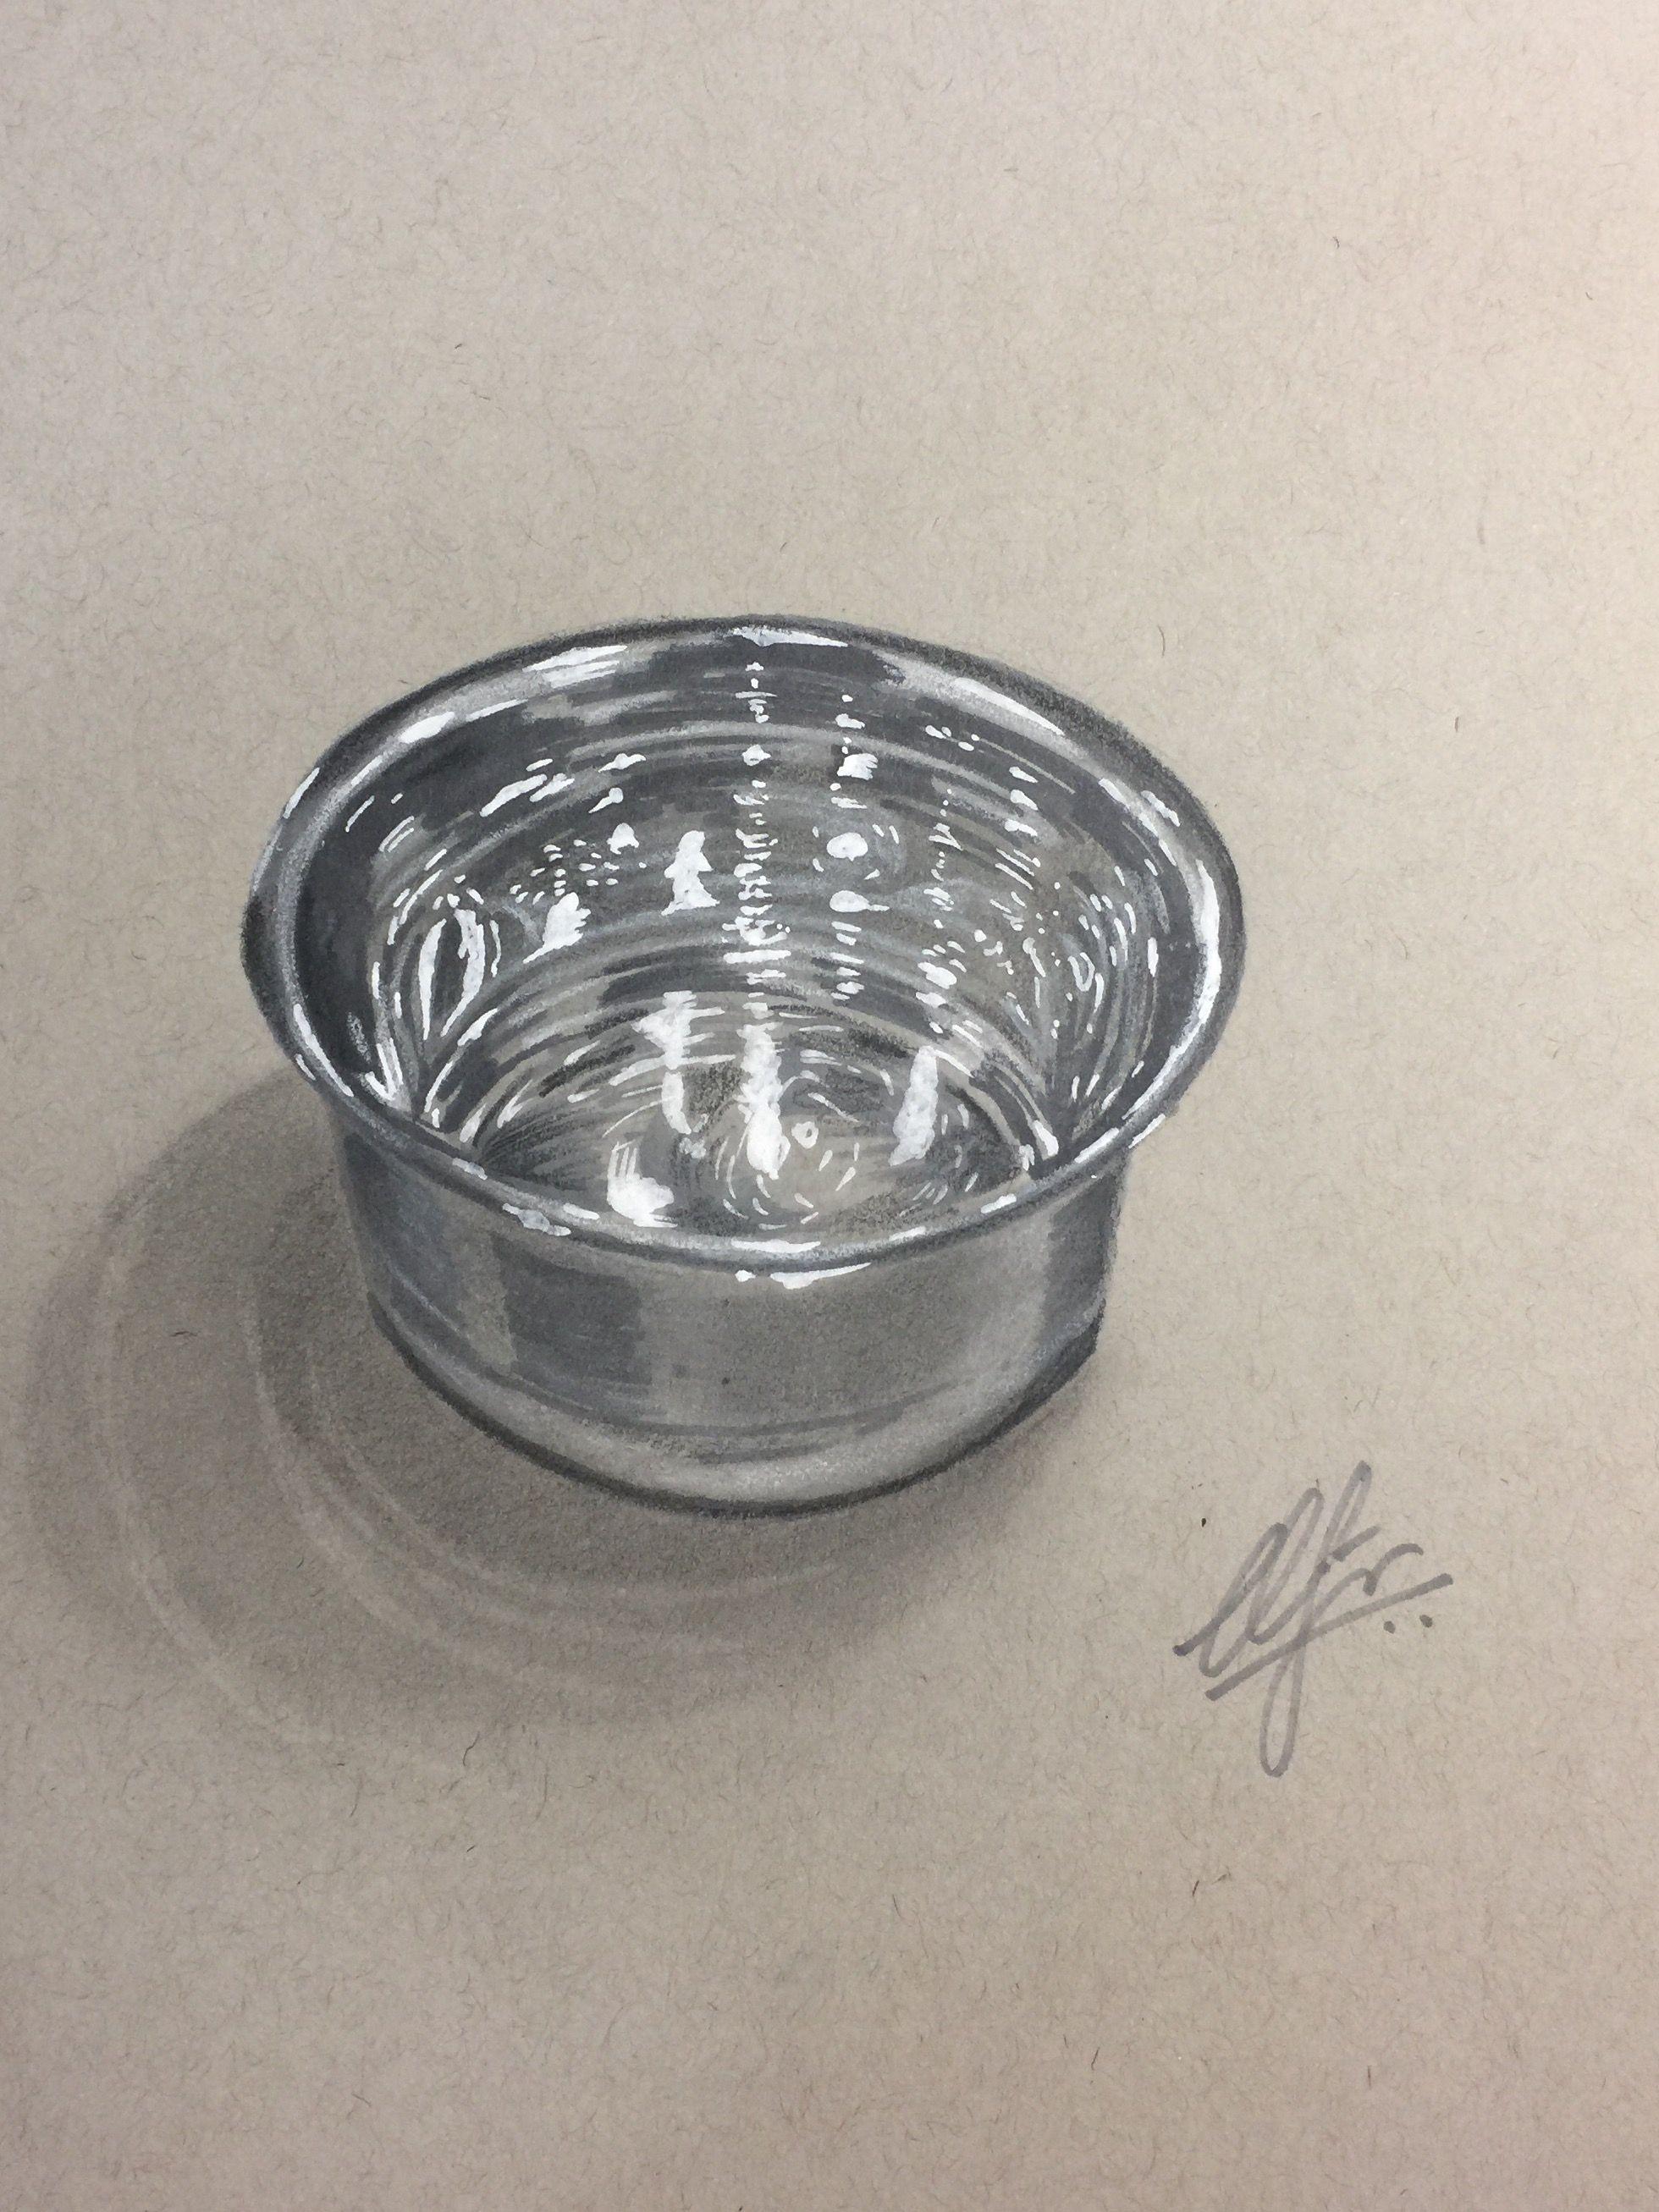 1960x2614 Realistic Steel Bowl Drawing Realistic Steel Bowl Drawing